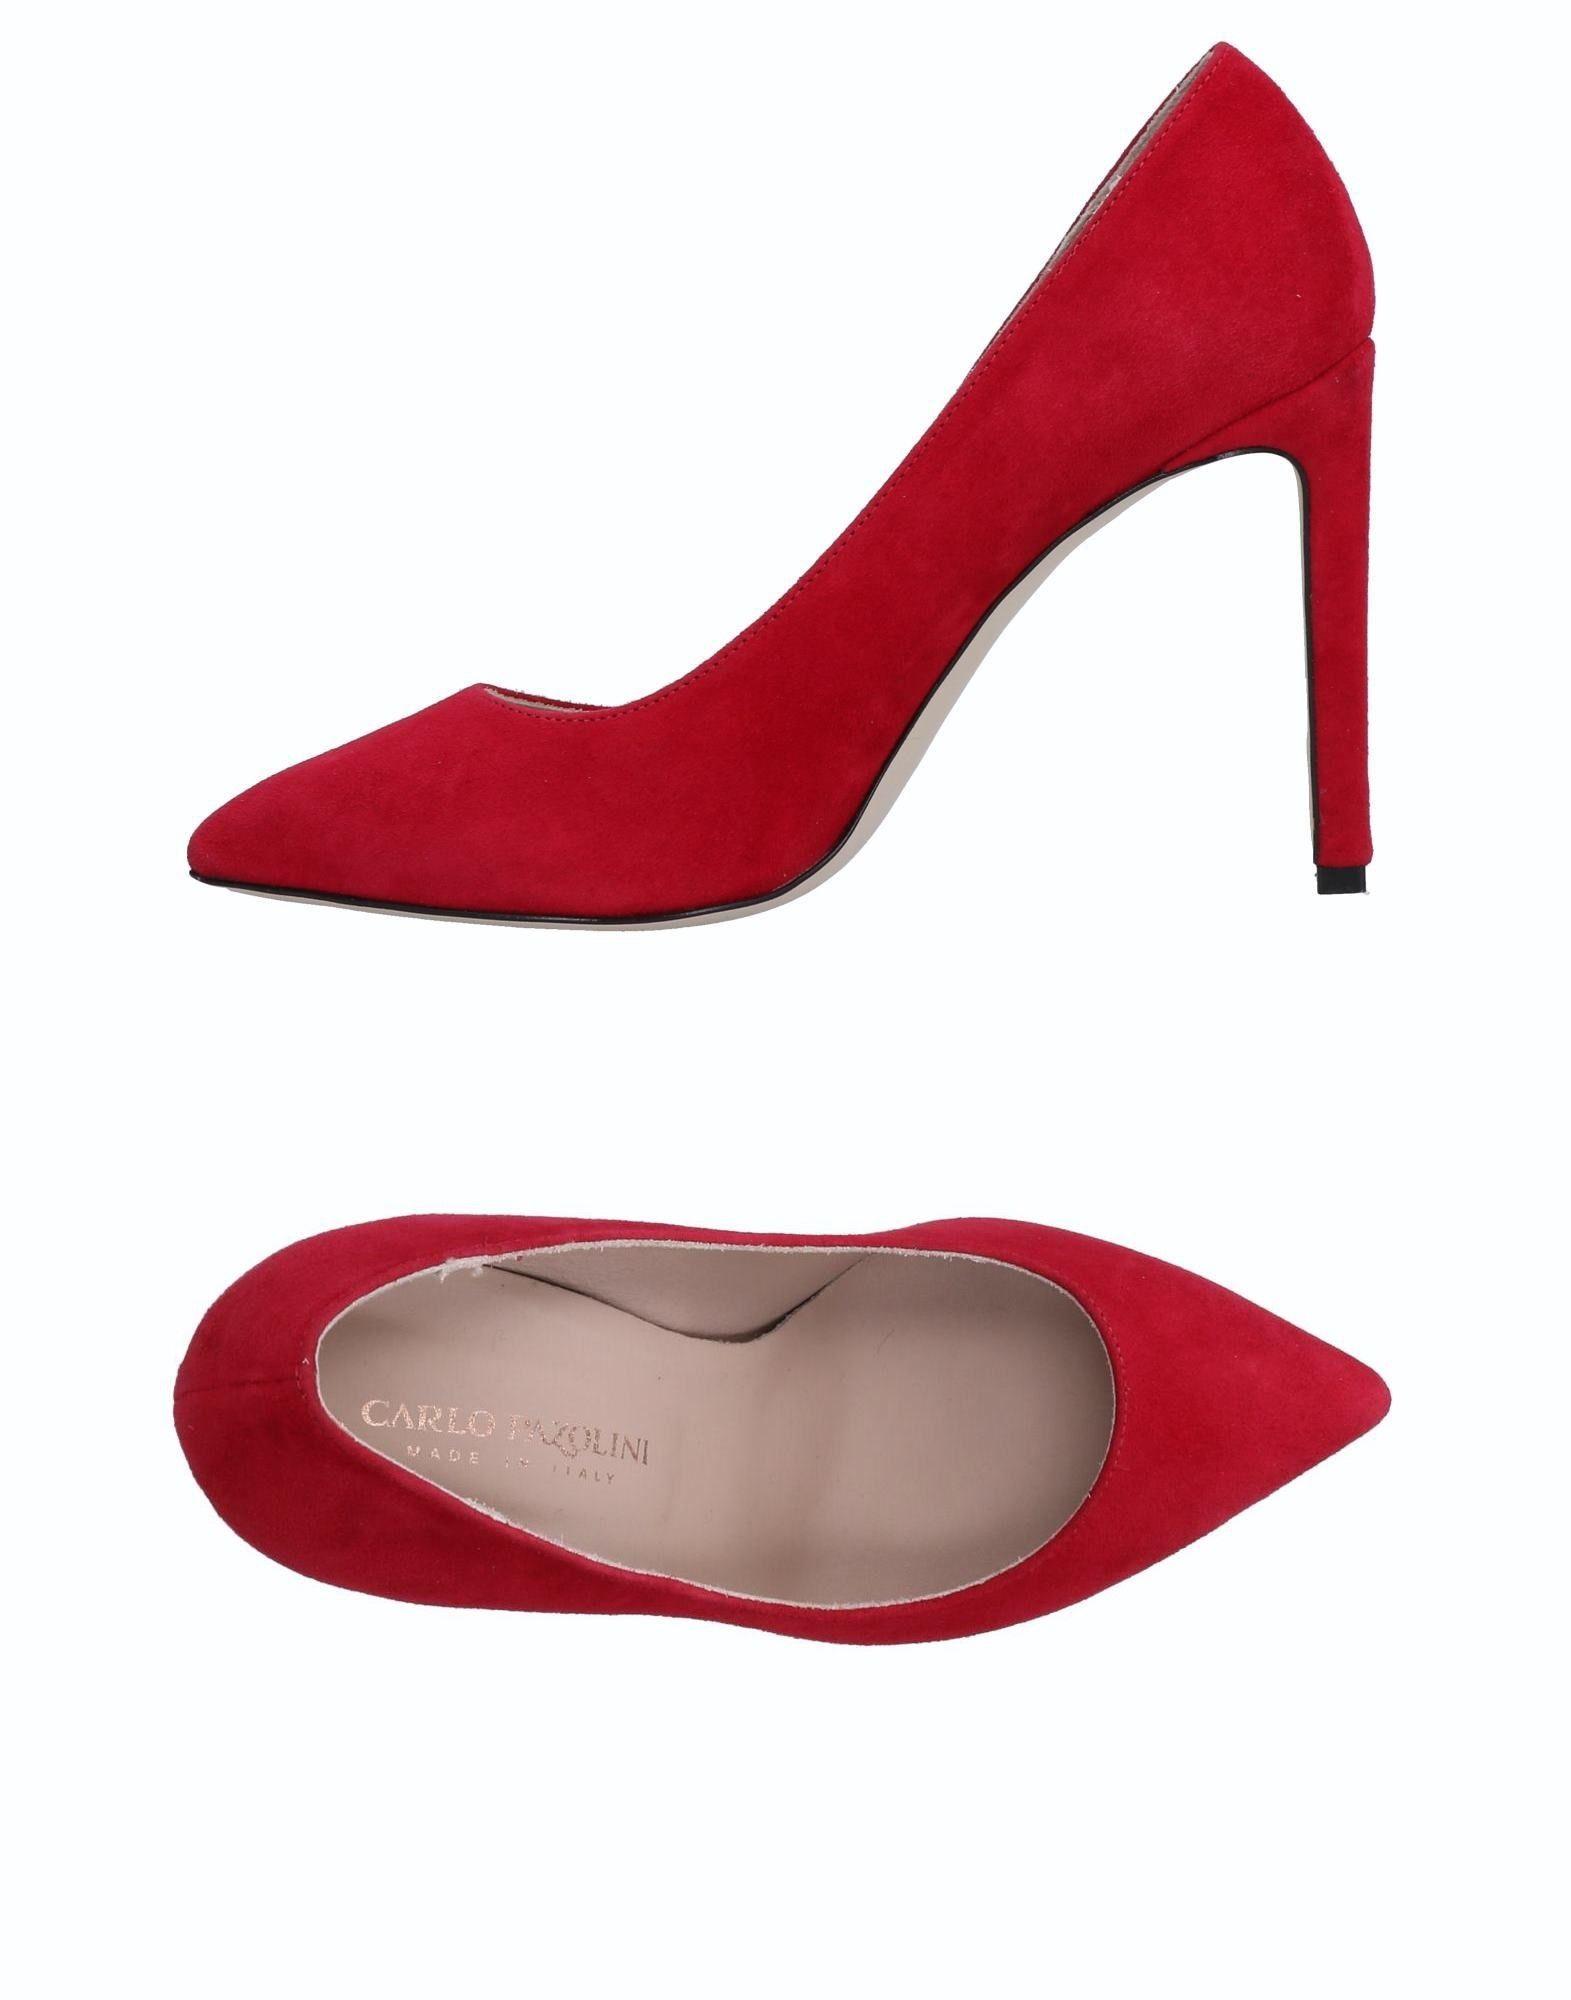 Carlo Pazolini Pumps Damen    11509938AO Gute Qualität beliebte Schuhe 88e502